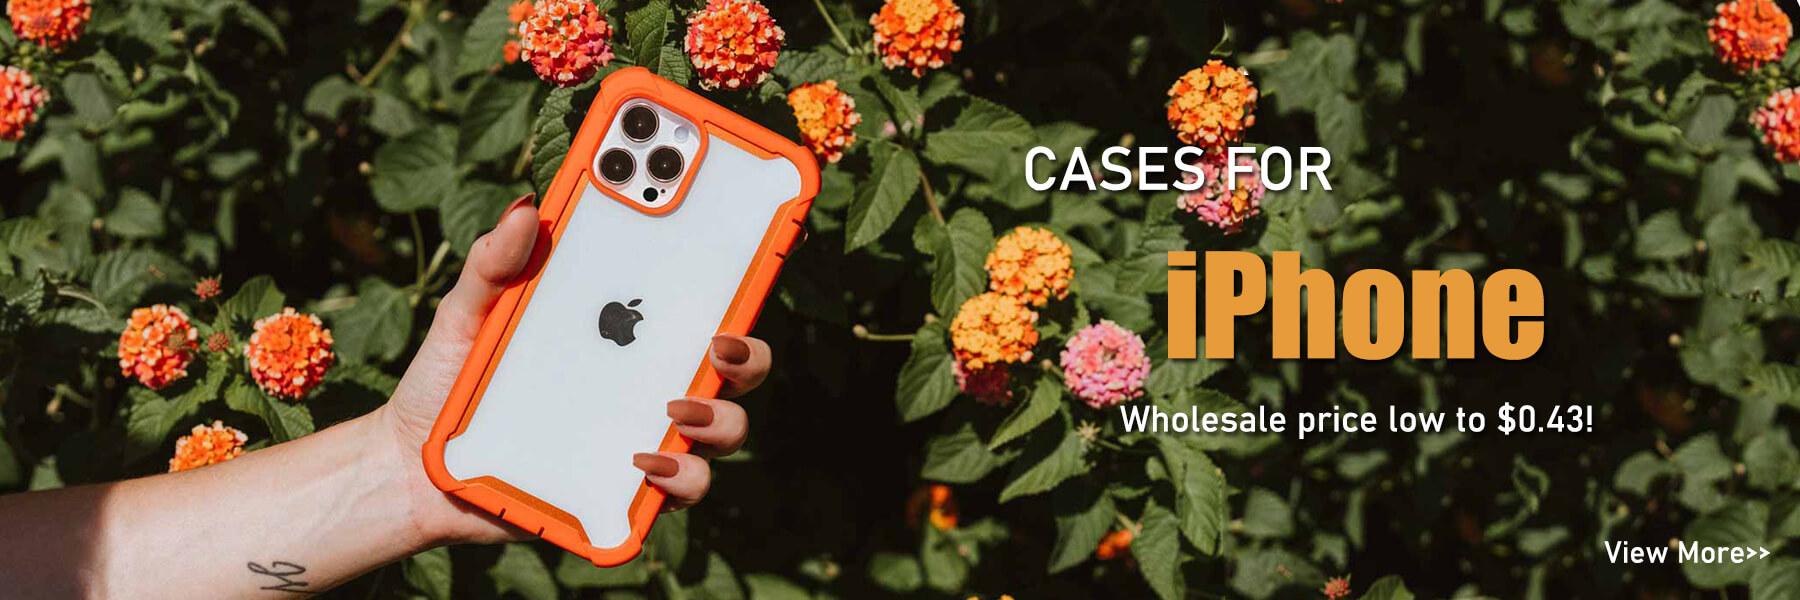 Wholesale Phone Cases